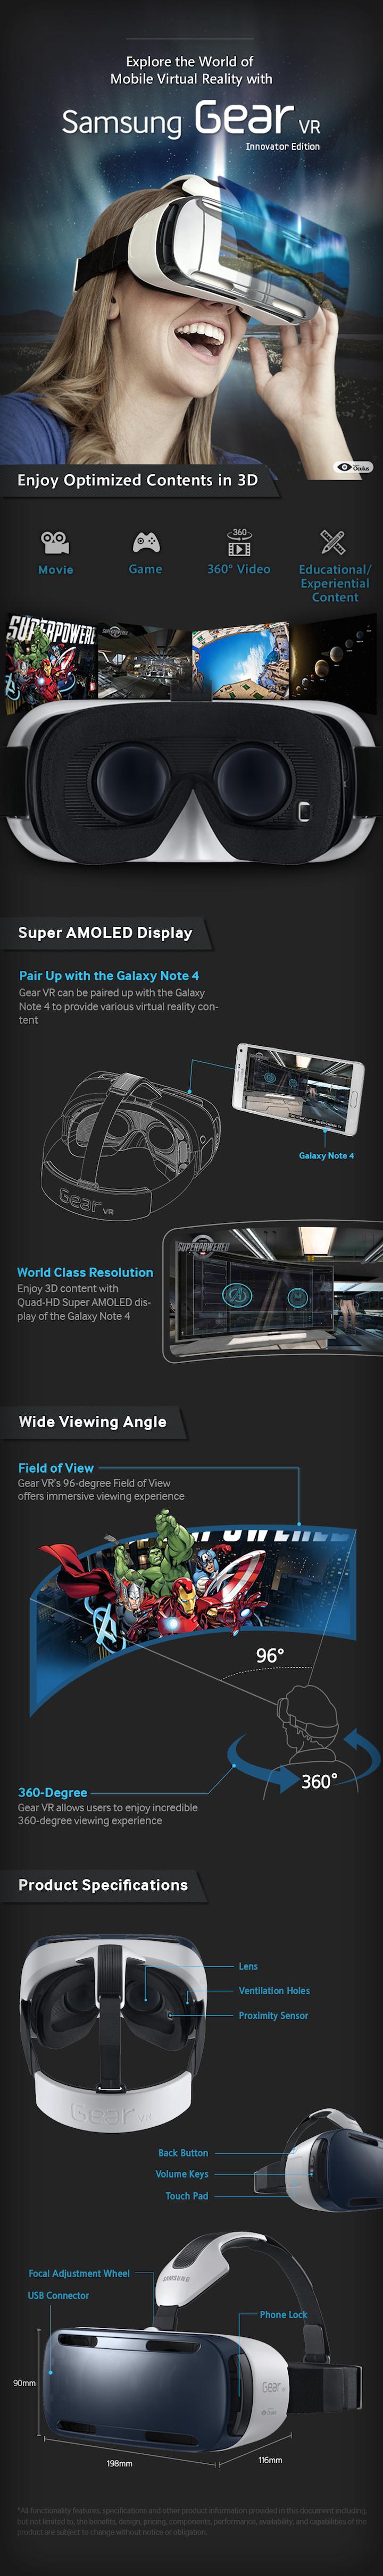 Samsung Gear VR - infografika